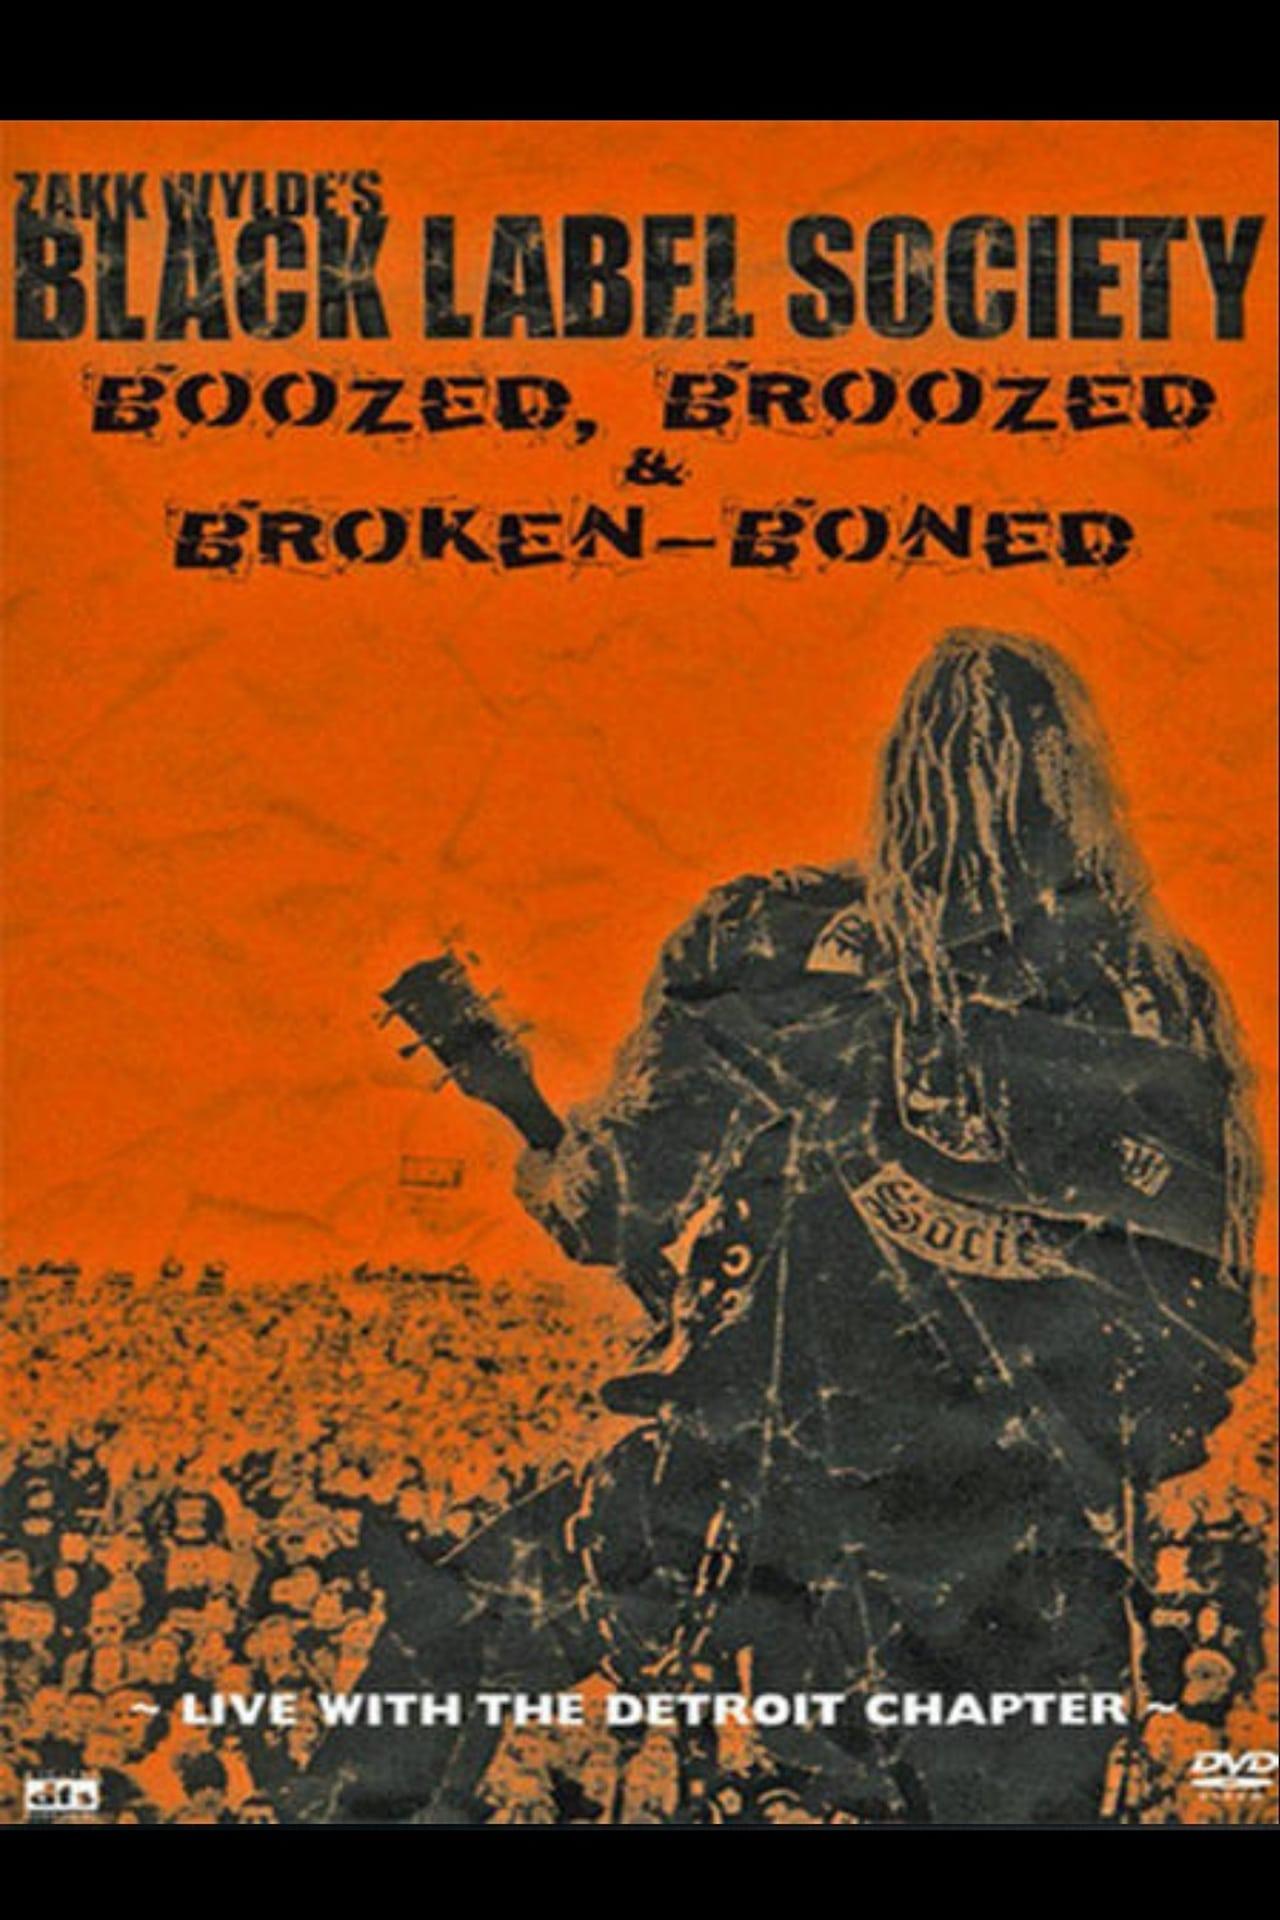 Black Label Society: Boozed, Broozed & Broken-Boned